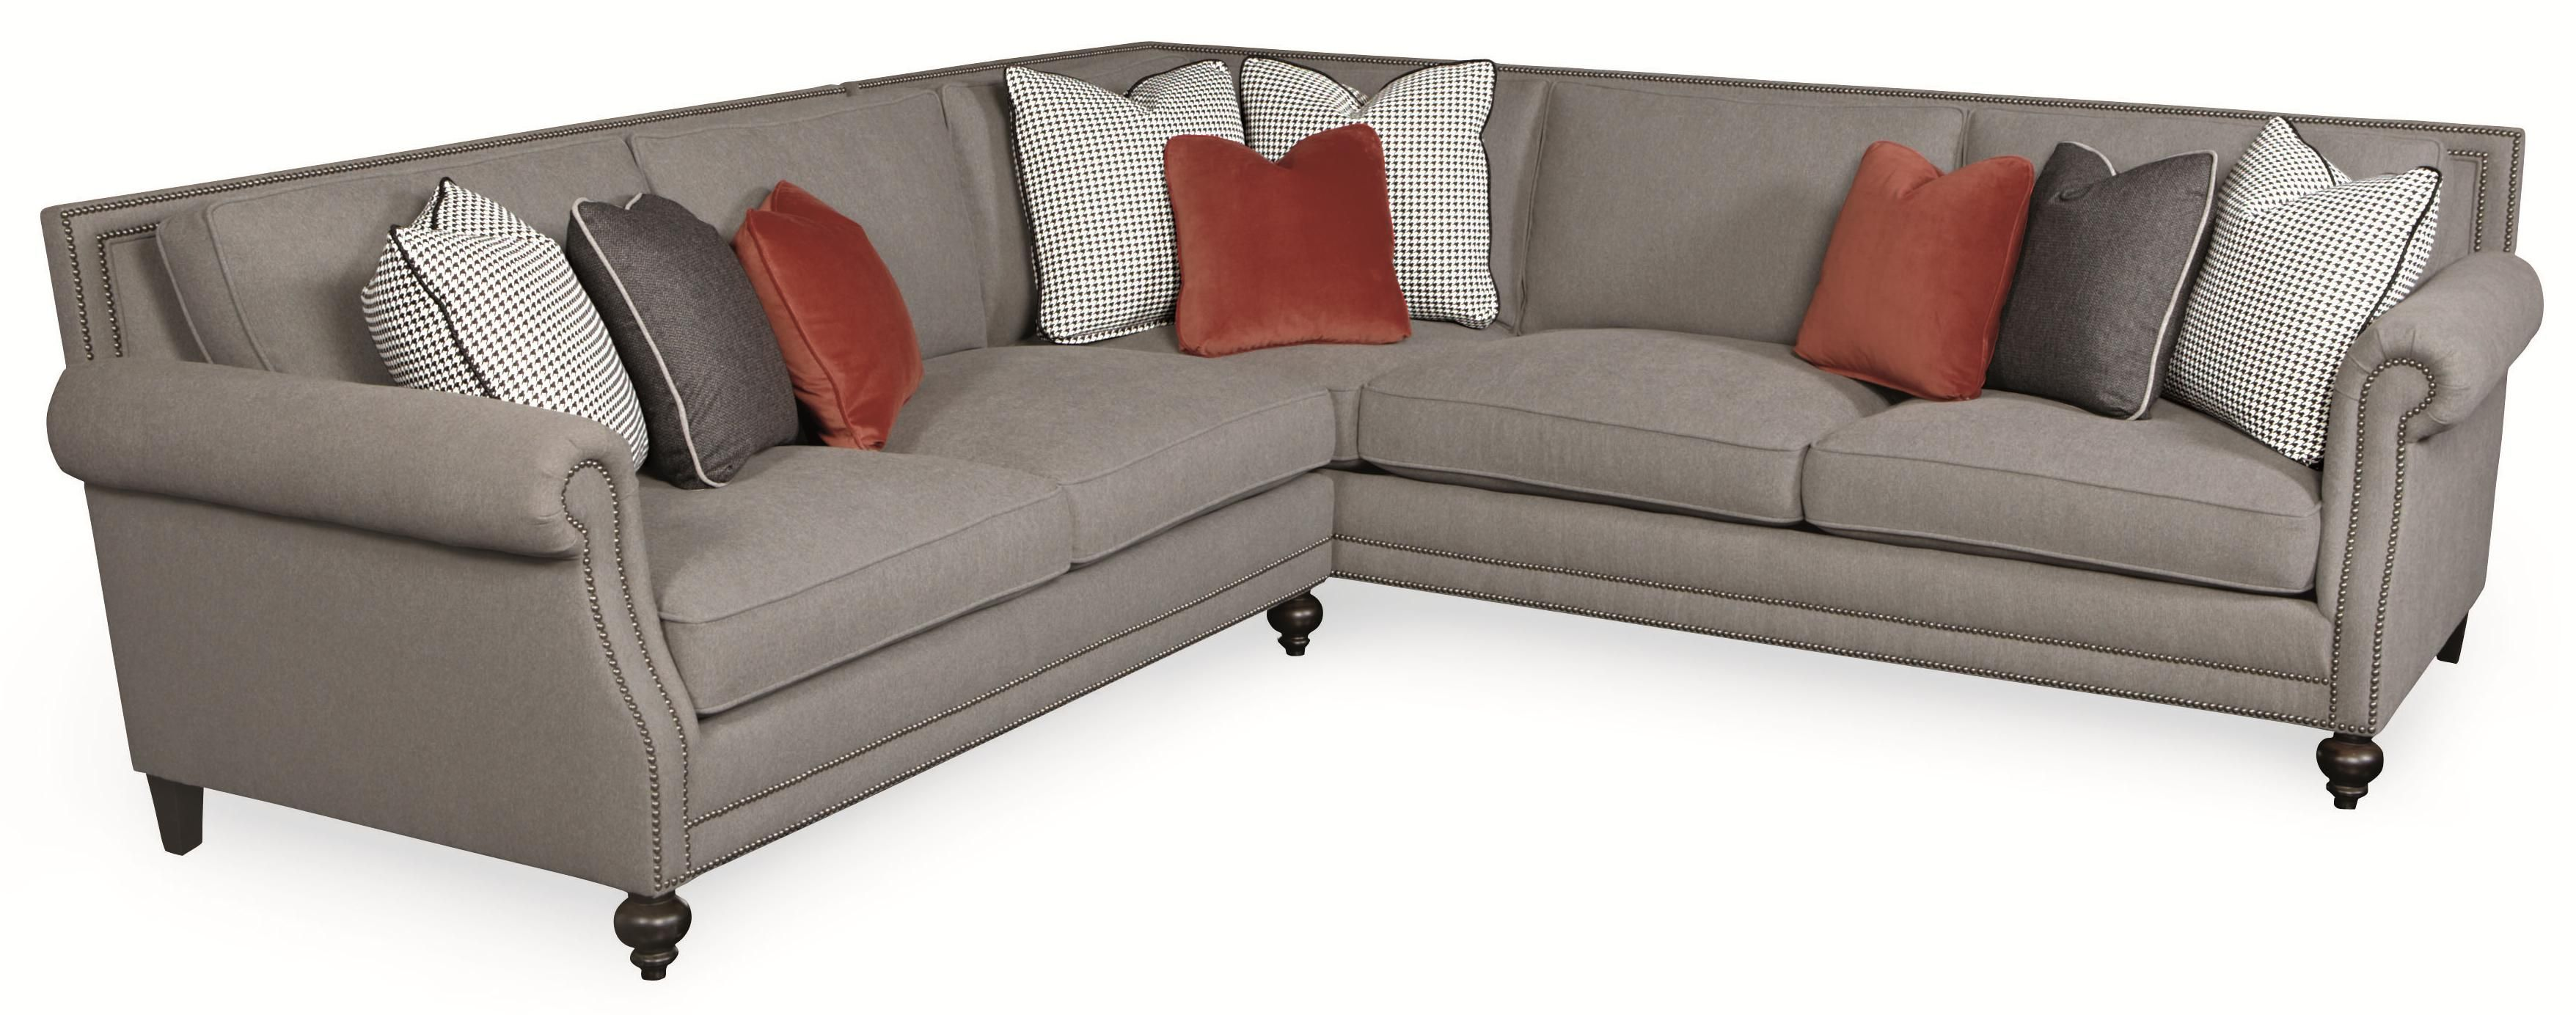 bernhardt sofa price list rooms to go denim sleeper crawford thesofa